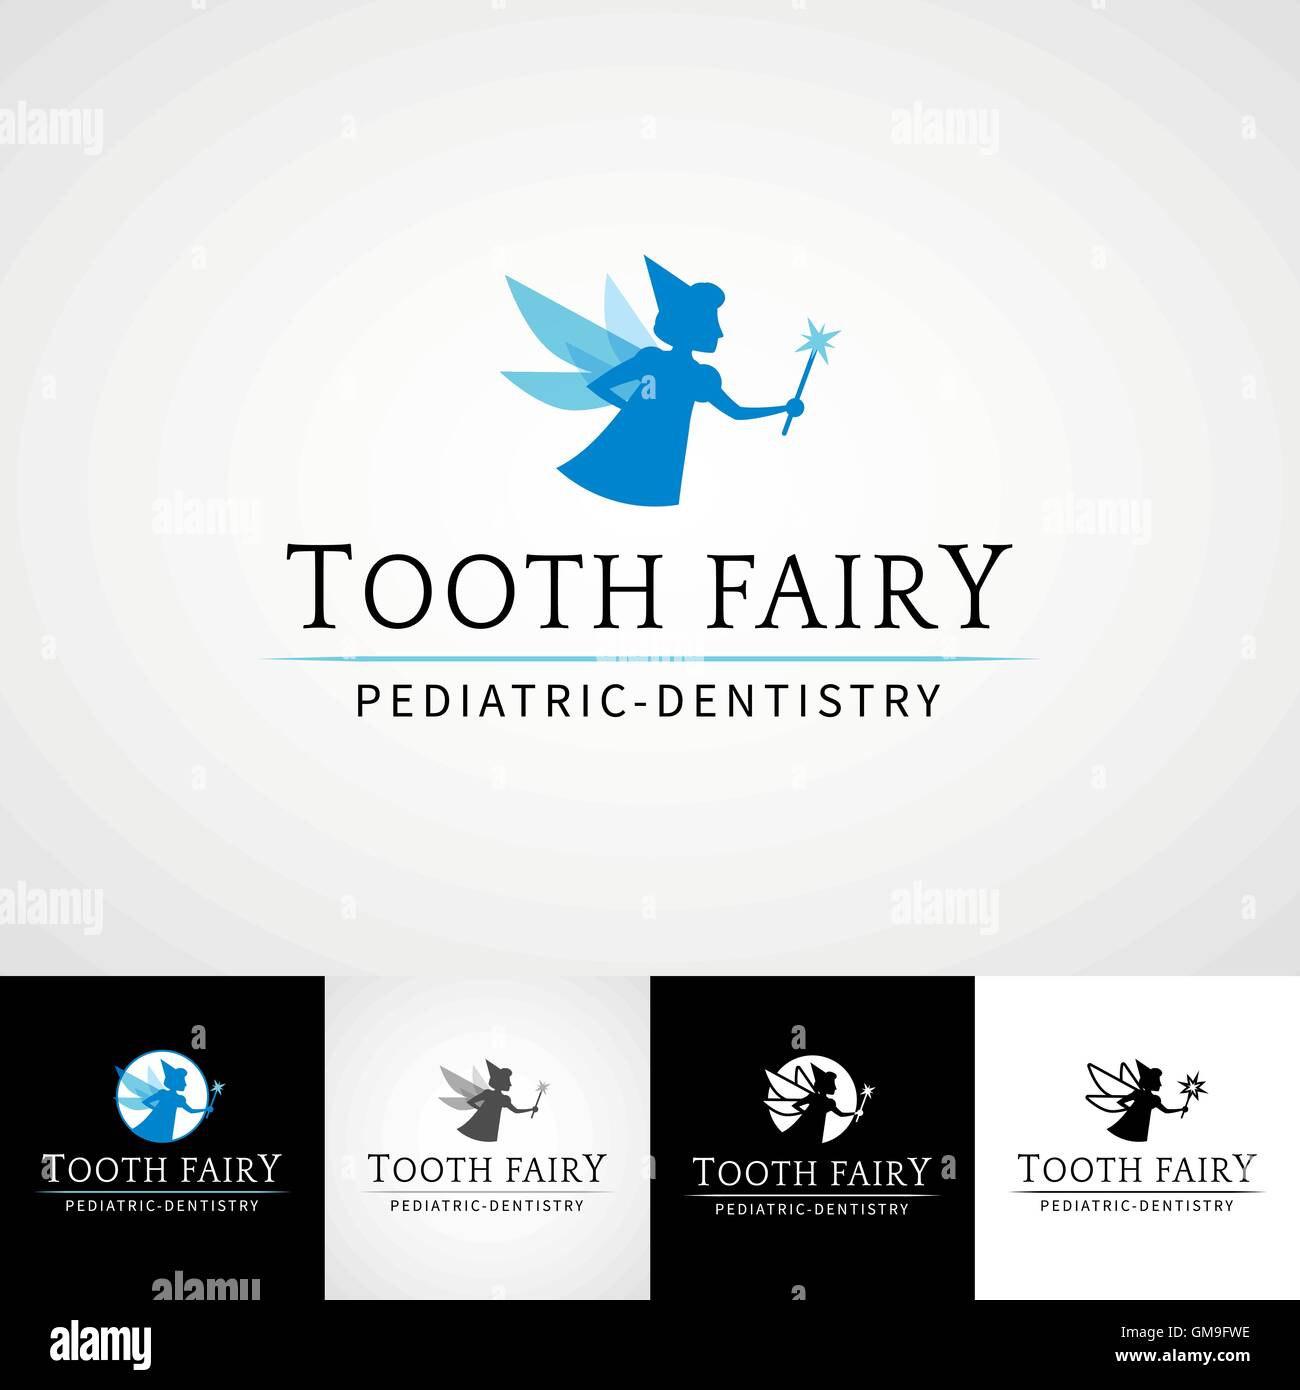 image regarding Tooth Fairy Stationary named Teeth fairy dental emblem template. Teethcare icon established